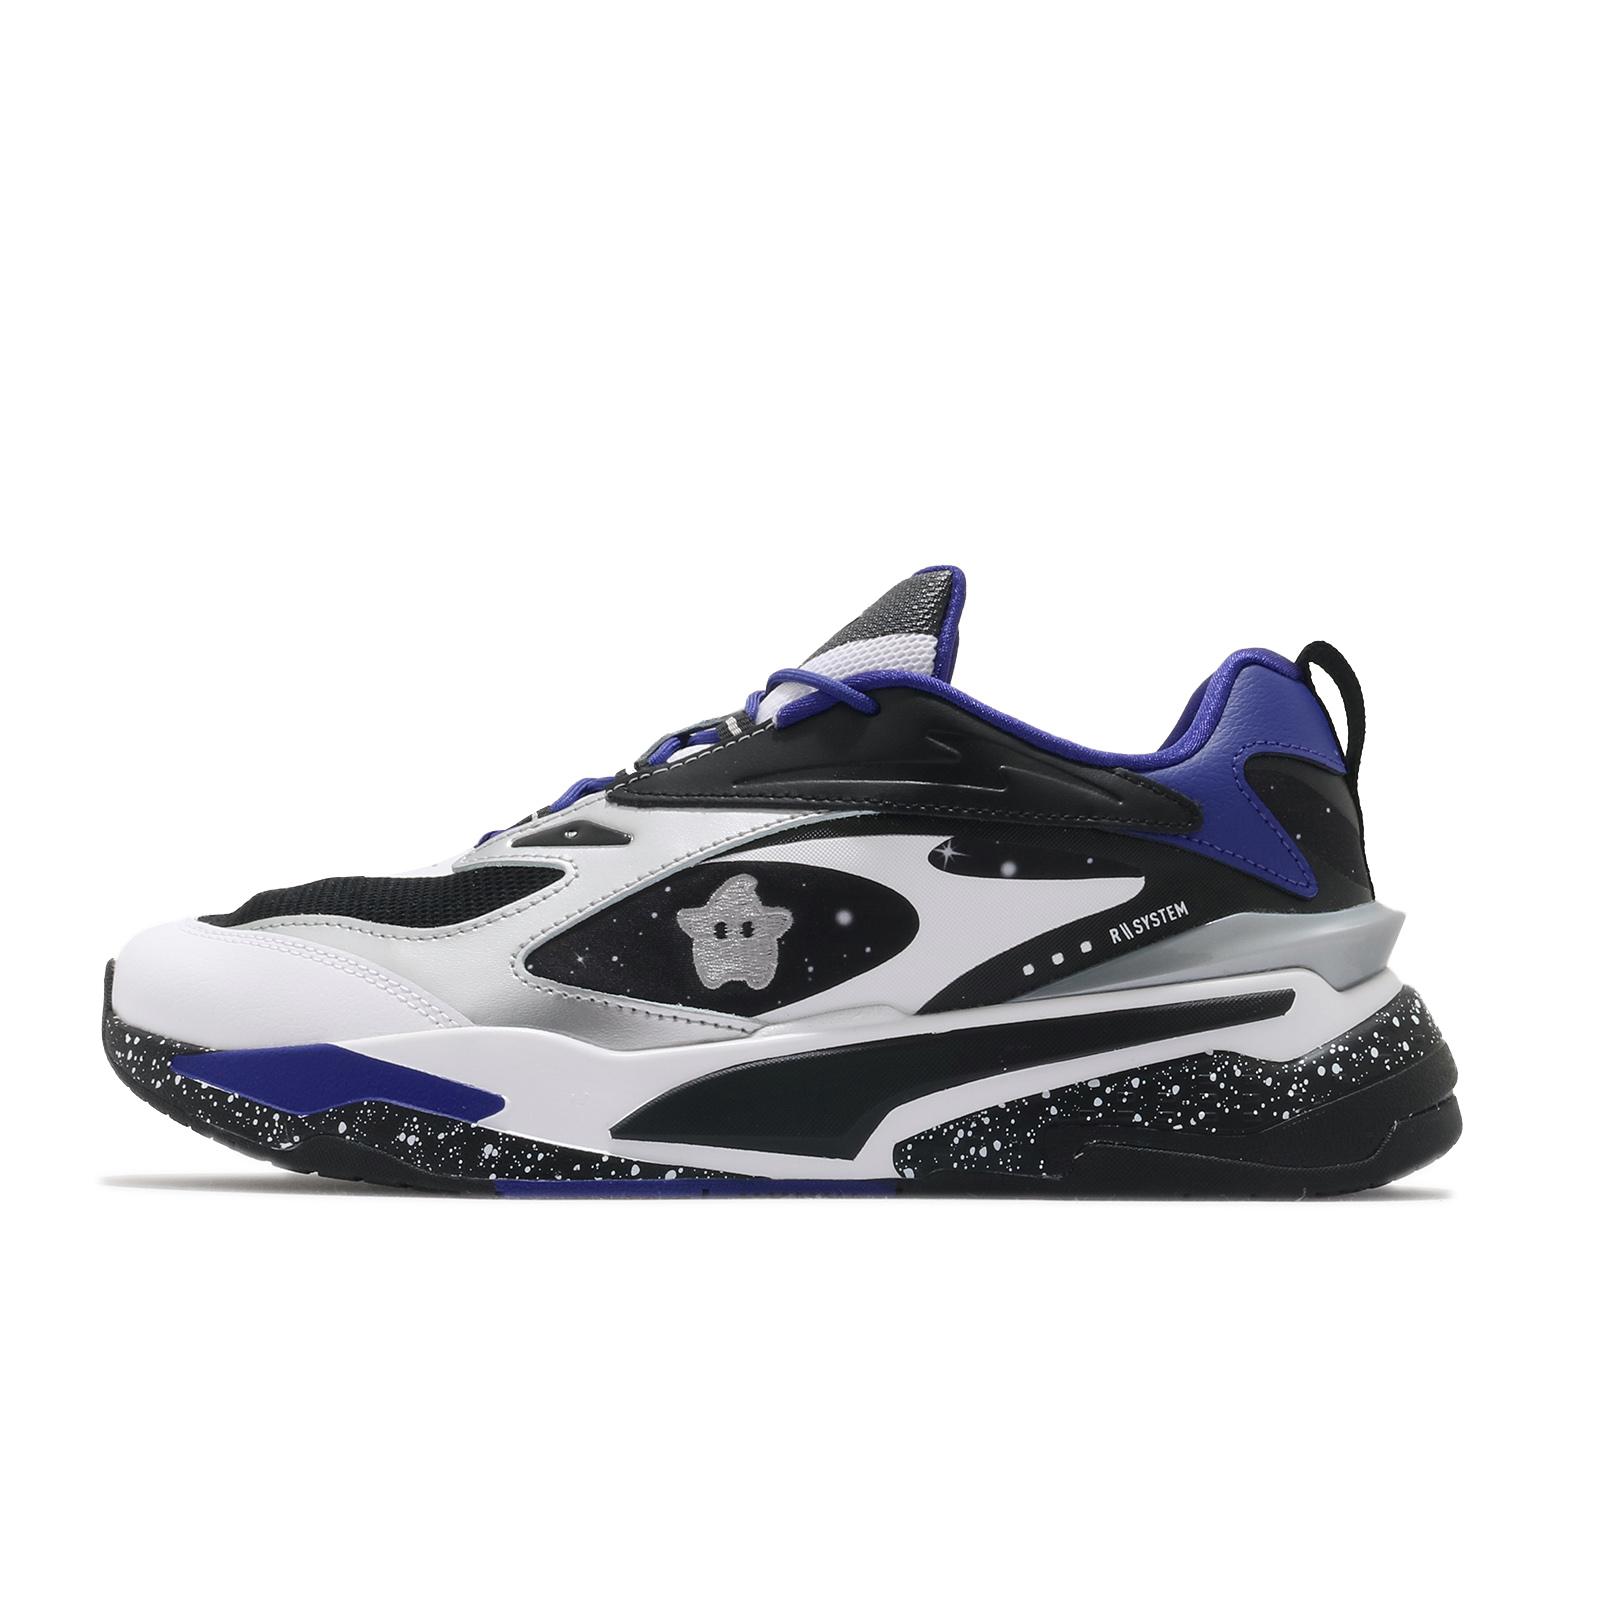 Puma x Super Mario 休閒鞋 RS-Fast Galaxy 藍 黑 男鞋 超級瑪利歐 星星 【ACS】